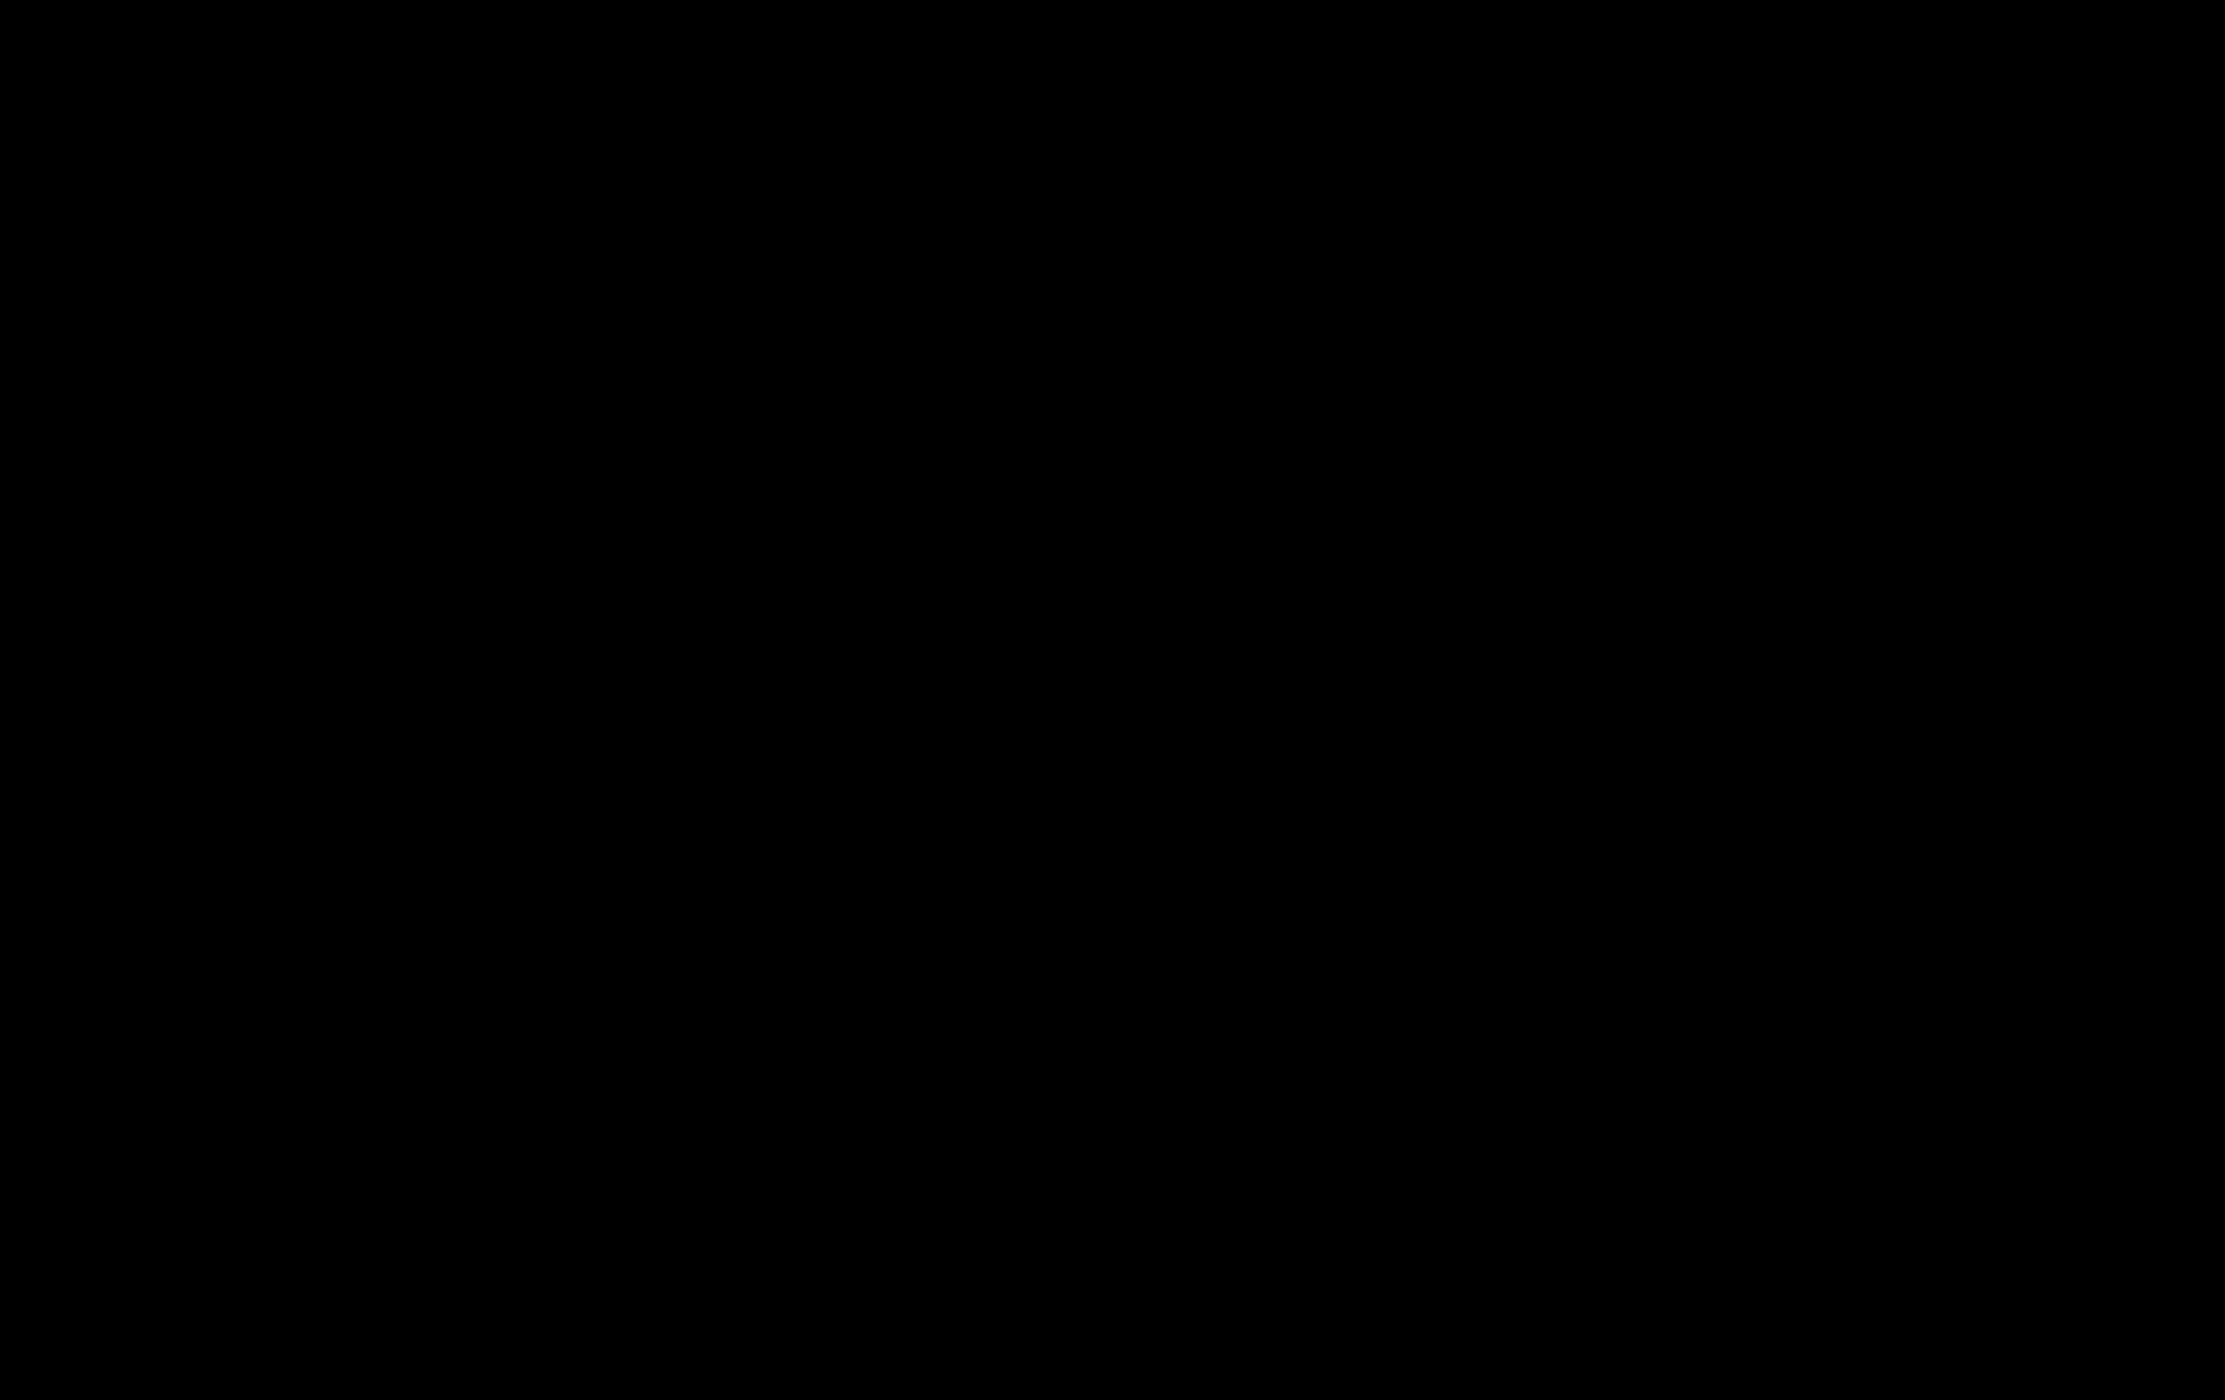 CircuitMess_Sign+42